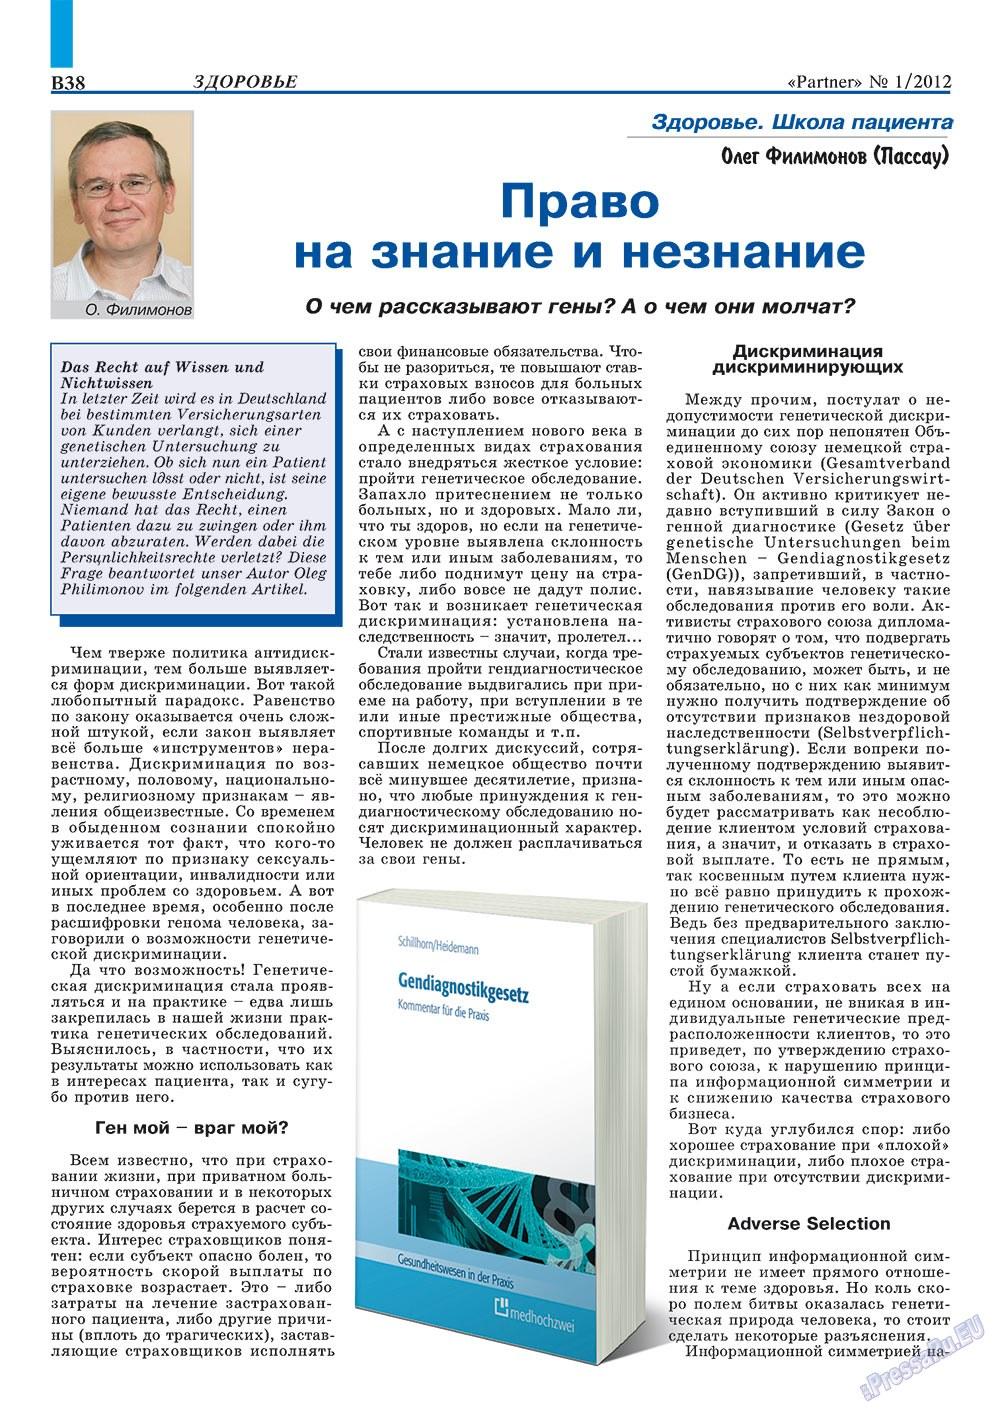 Партнер-север (журнал). 2012 год, номер 1, стр. 48